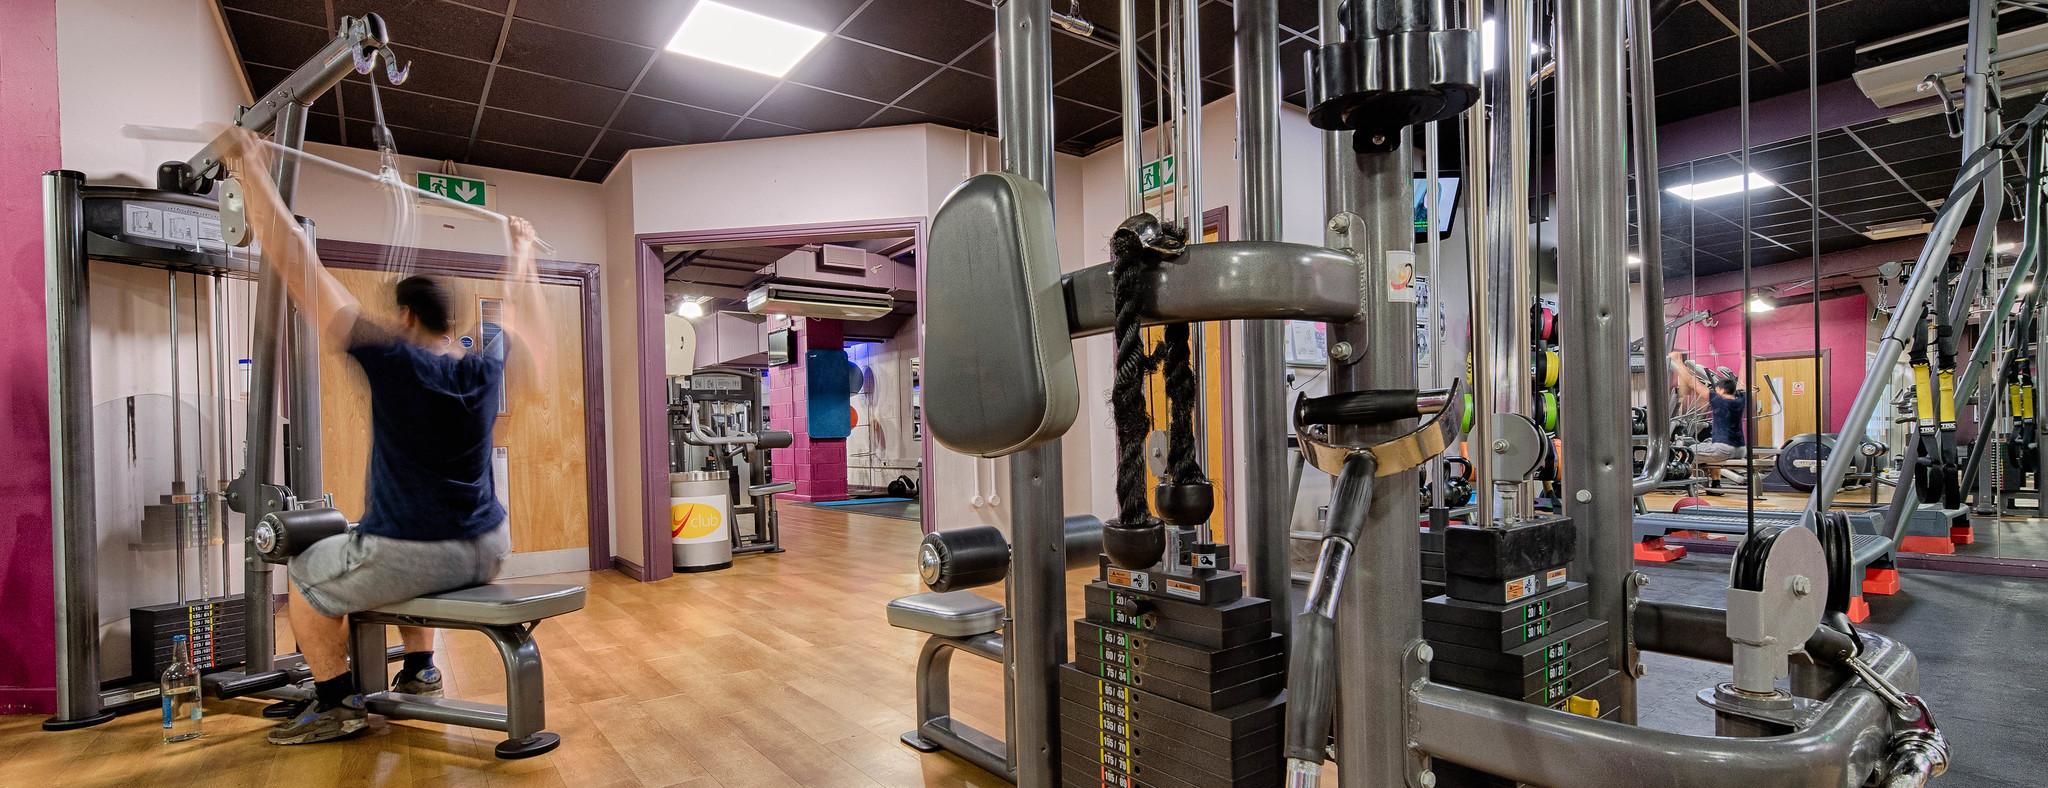 20170504 Yclub Gym Cables In Cardio